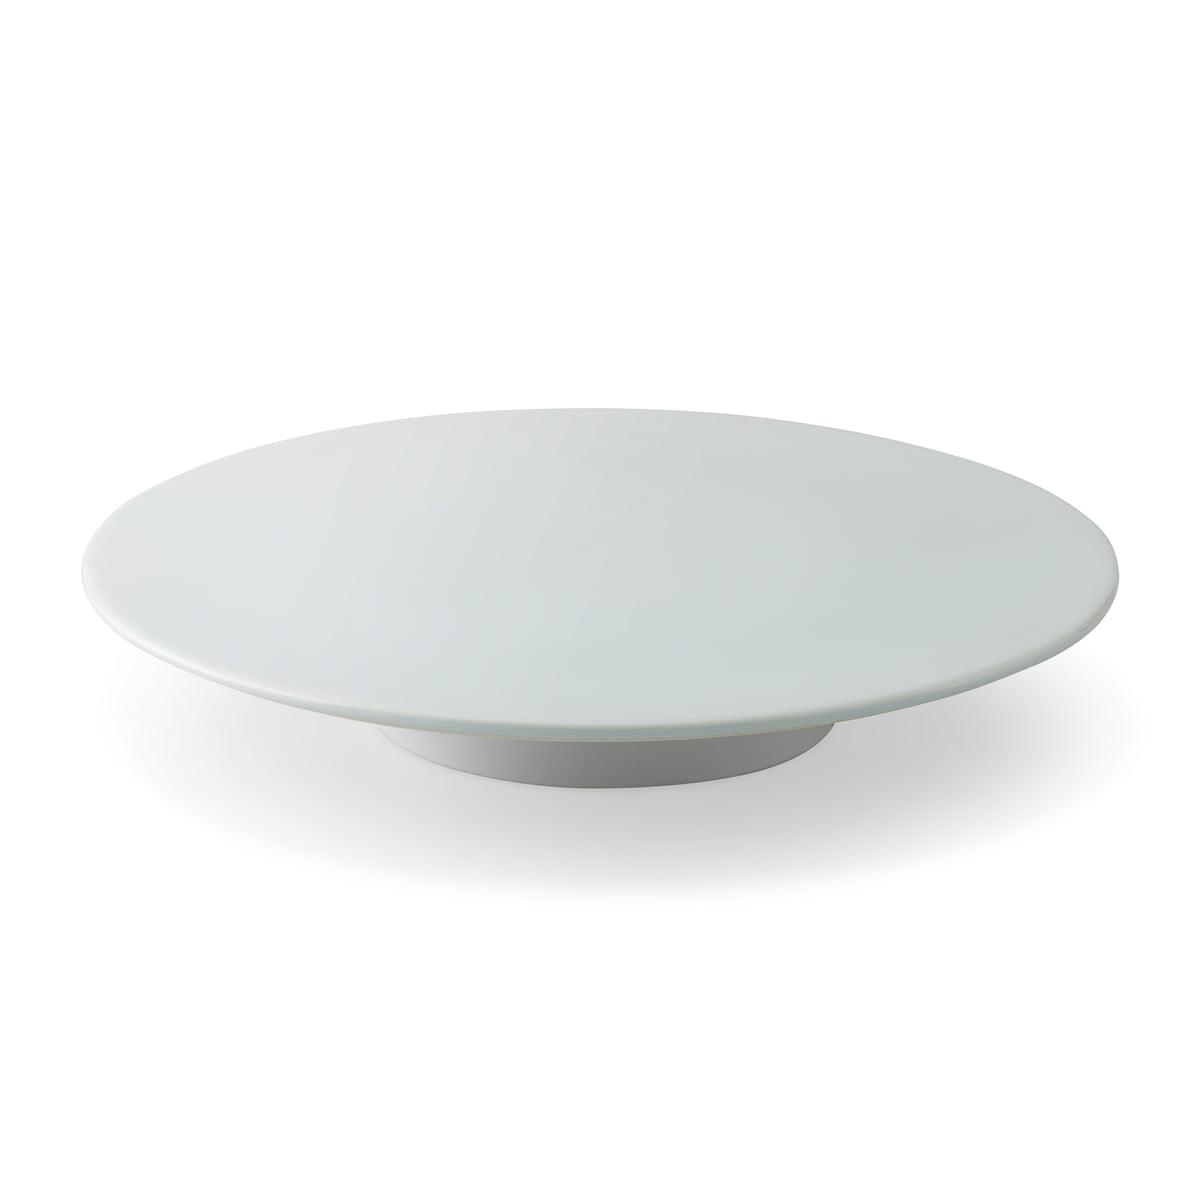 Stelton - Emma Cake Plate blue  sc 1 st  Connox & Emma Cake Plate by Stelton in the shop